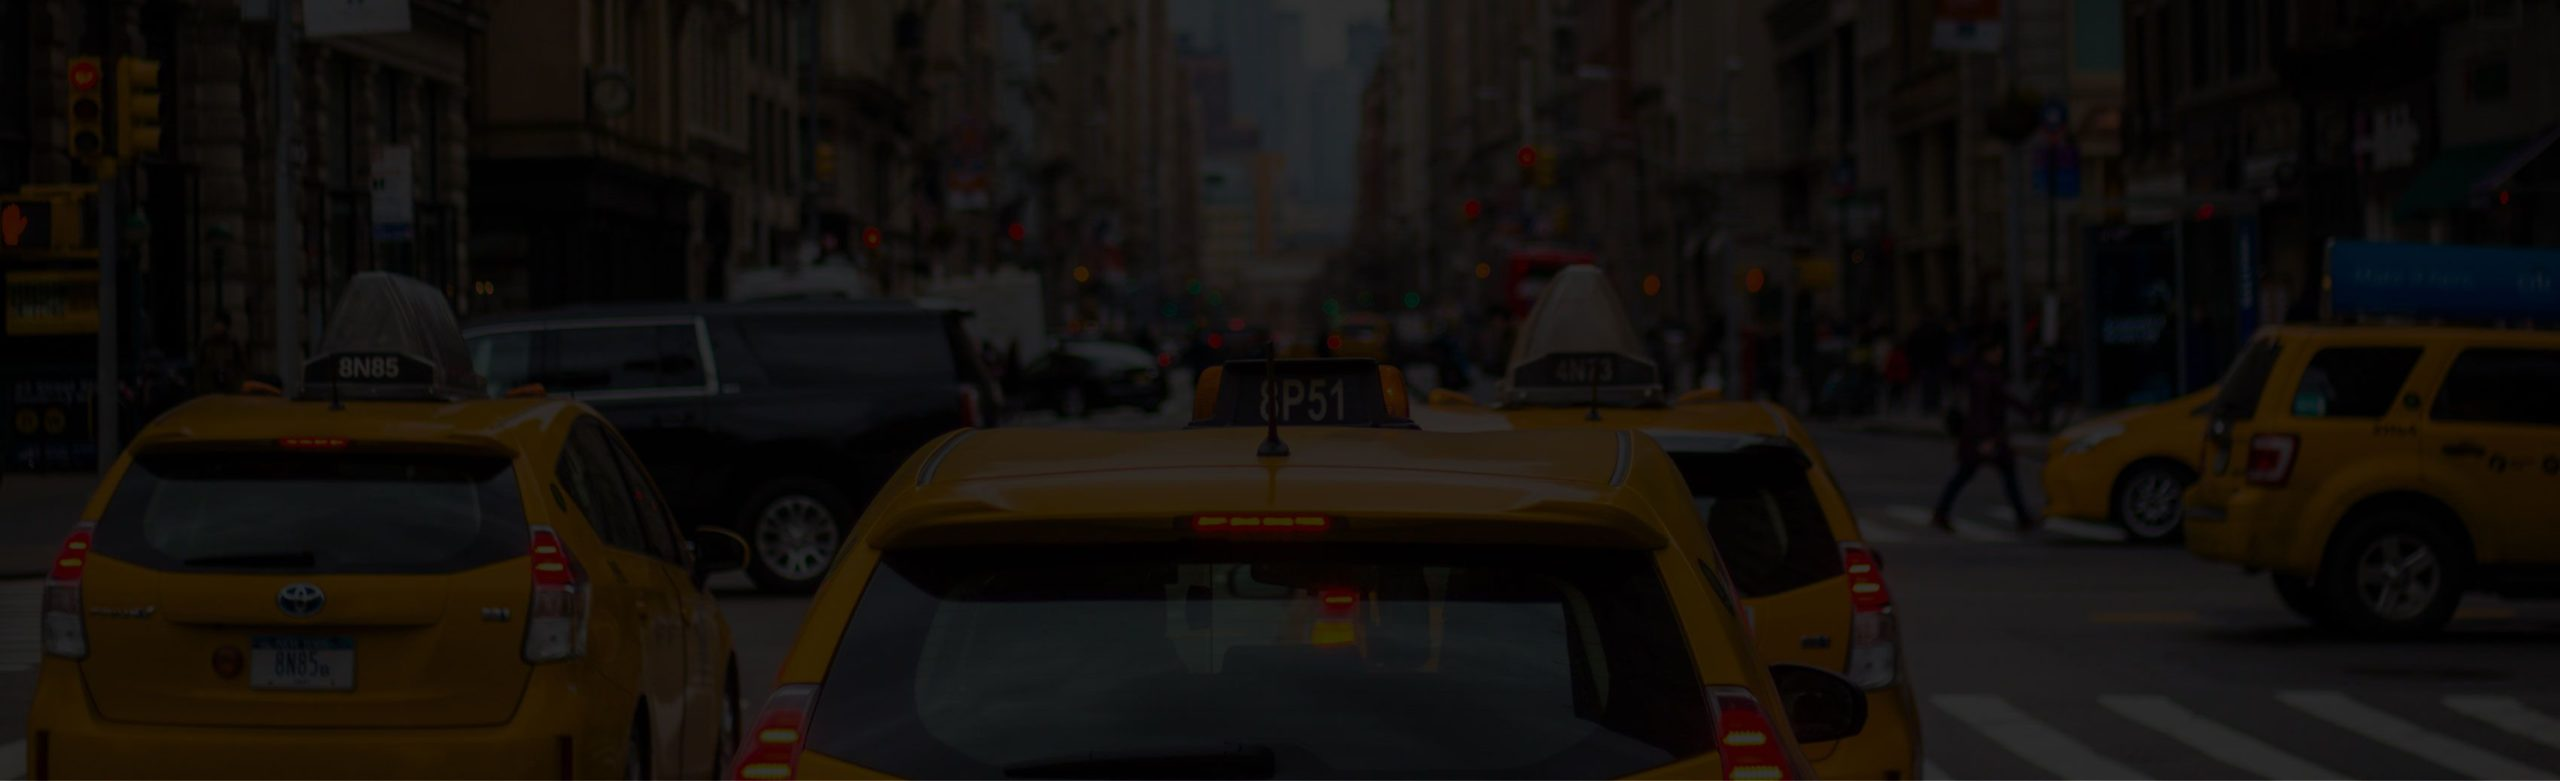 avada-taxi-testimonials-background